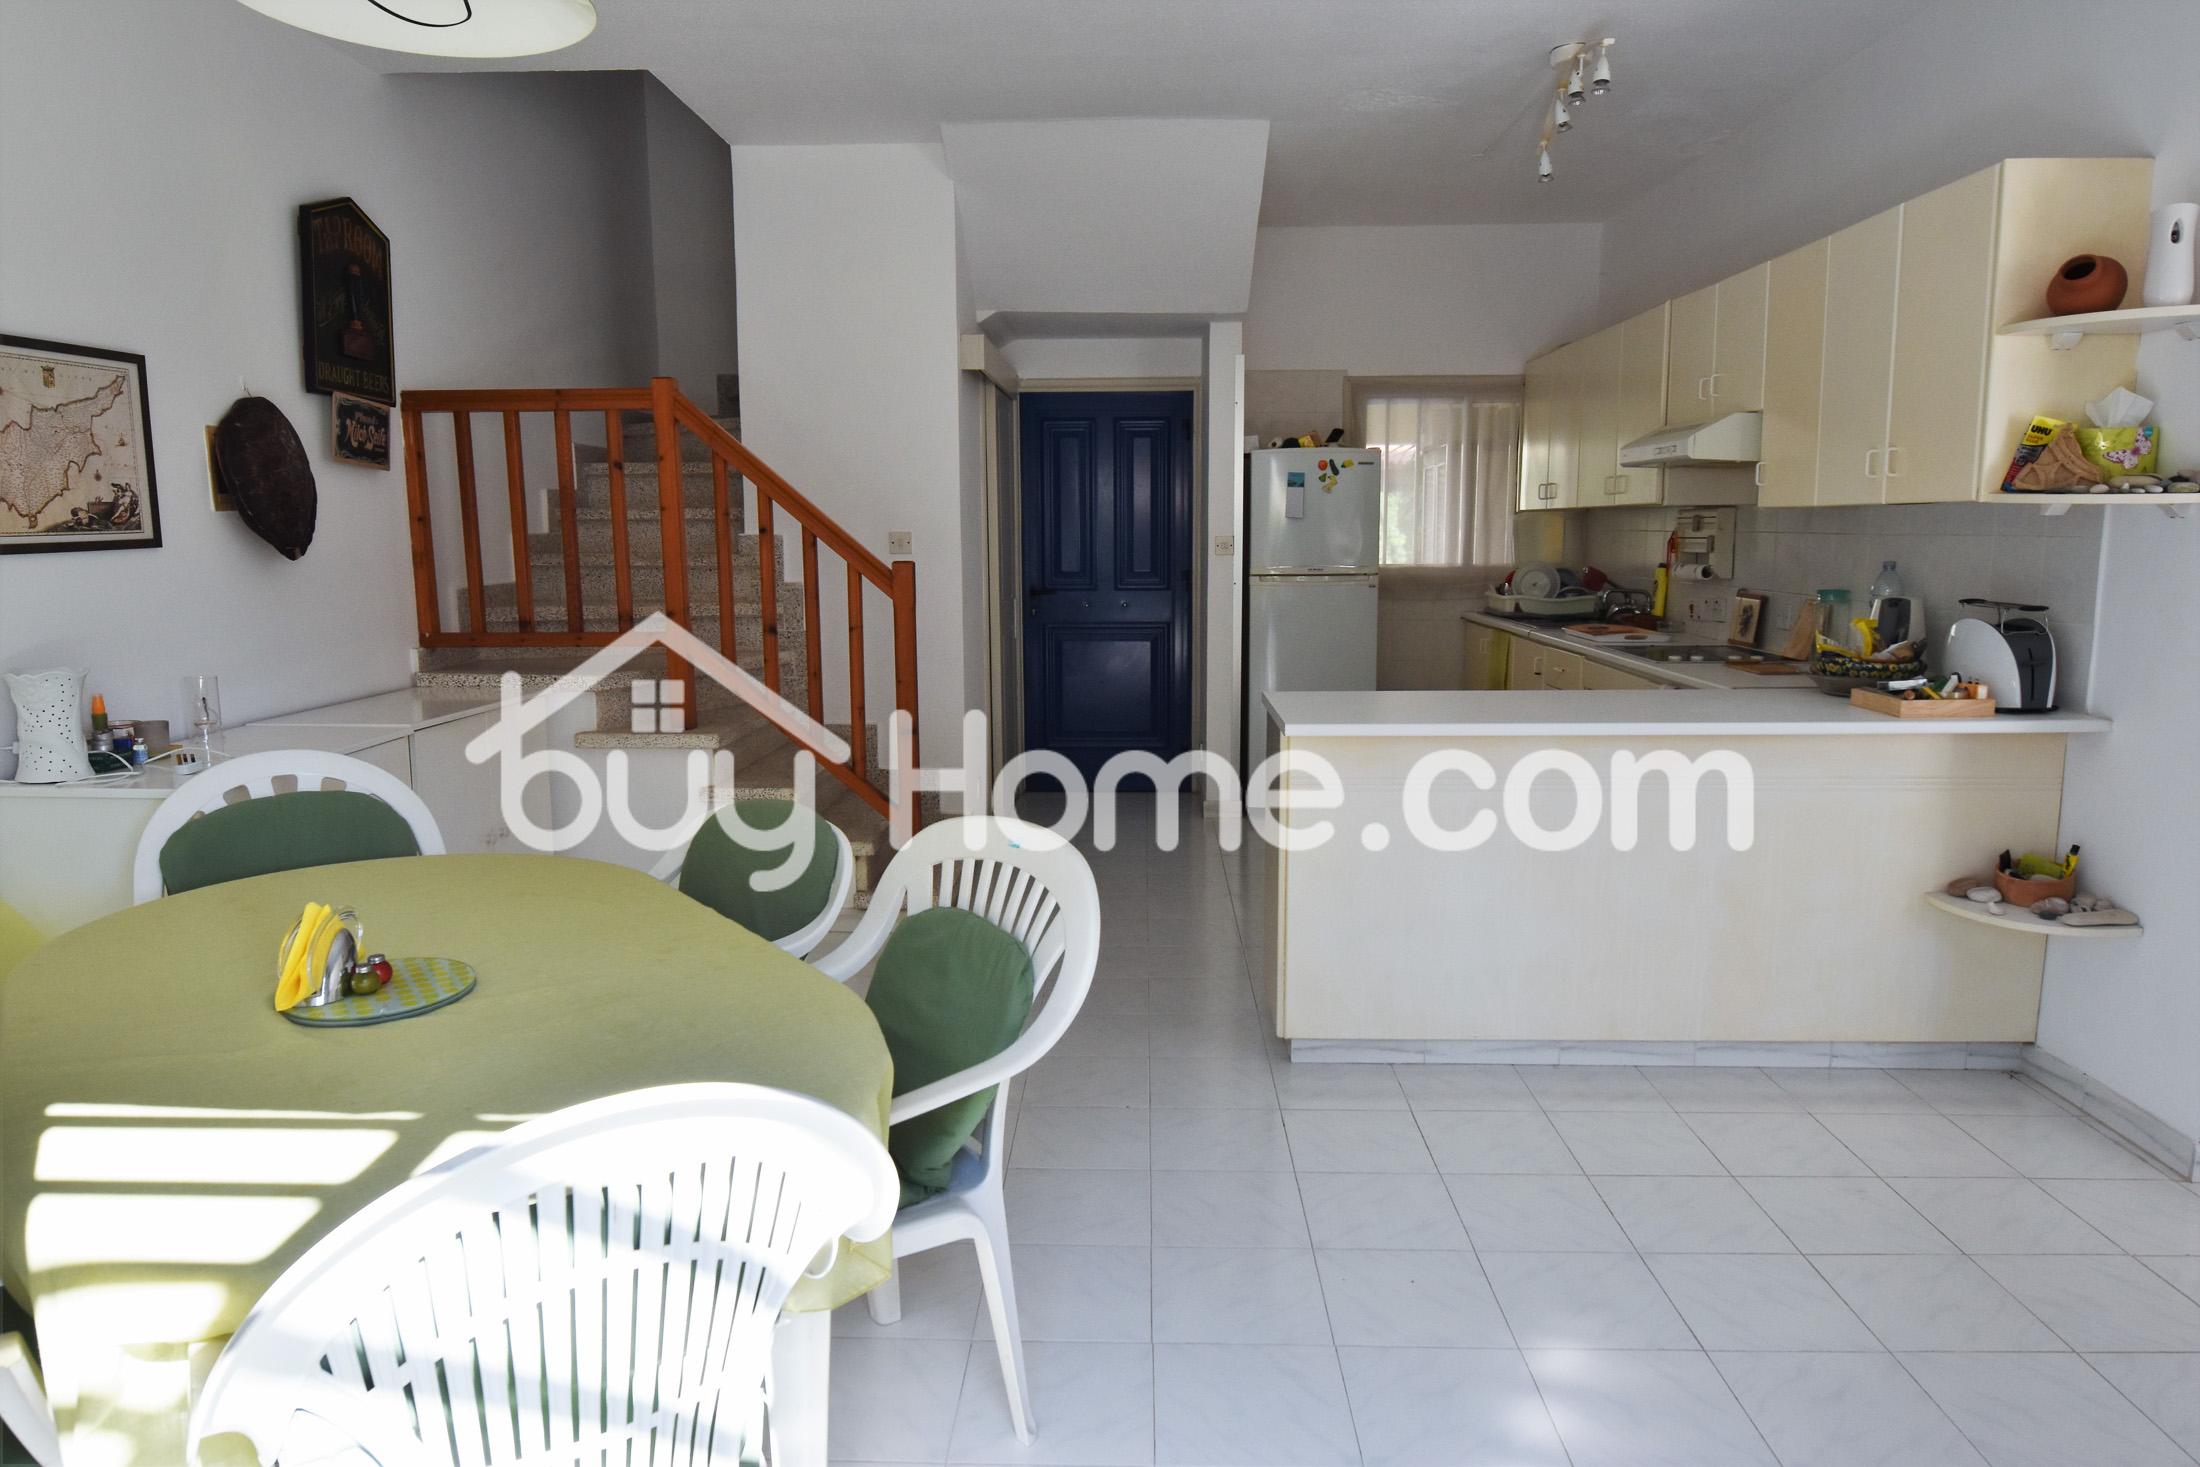 3 Bedroom Beach House | BuyHome